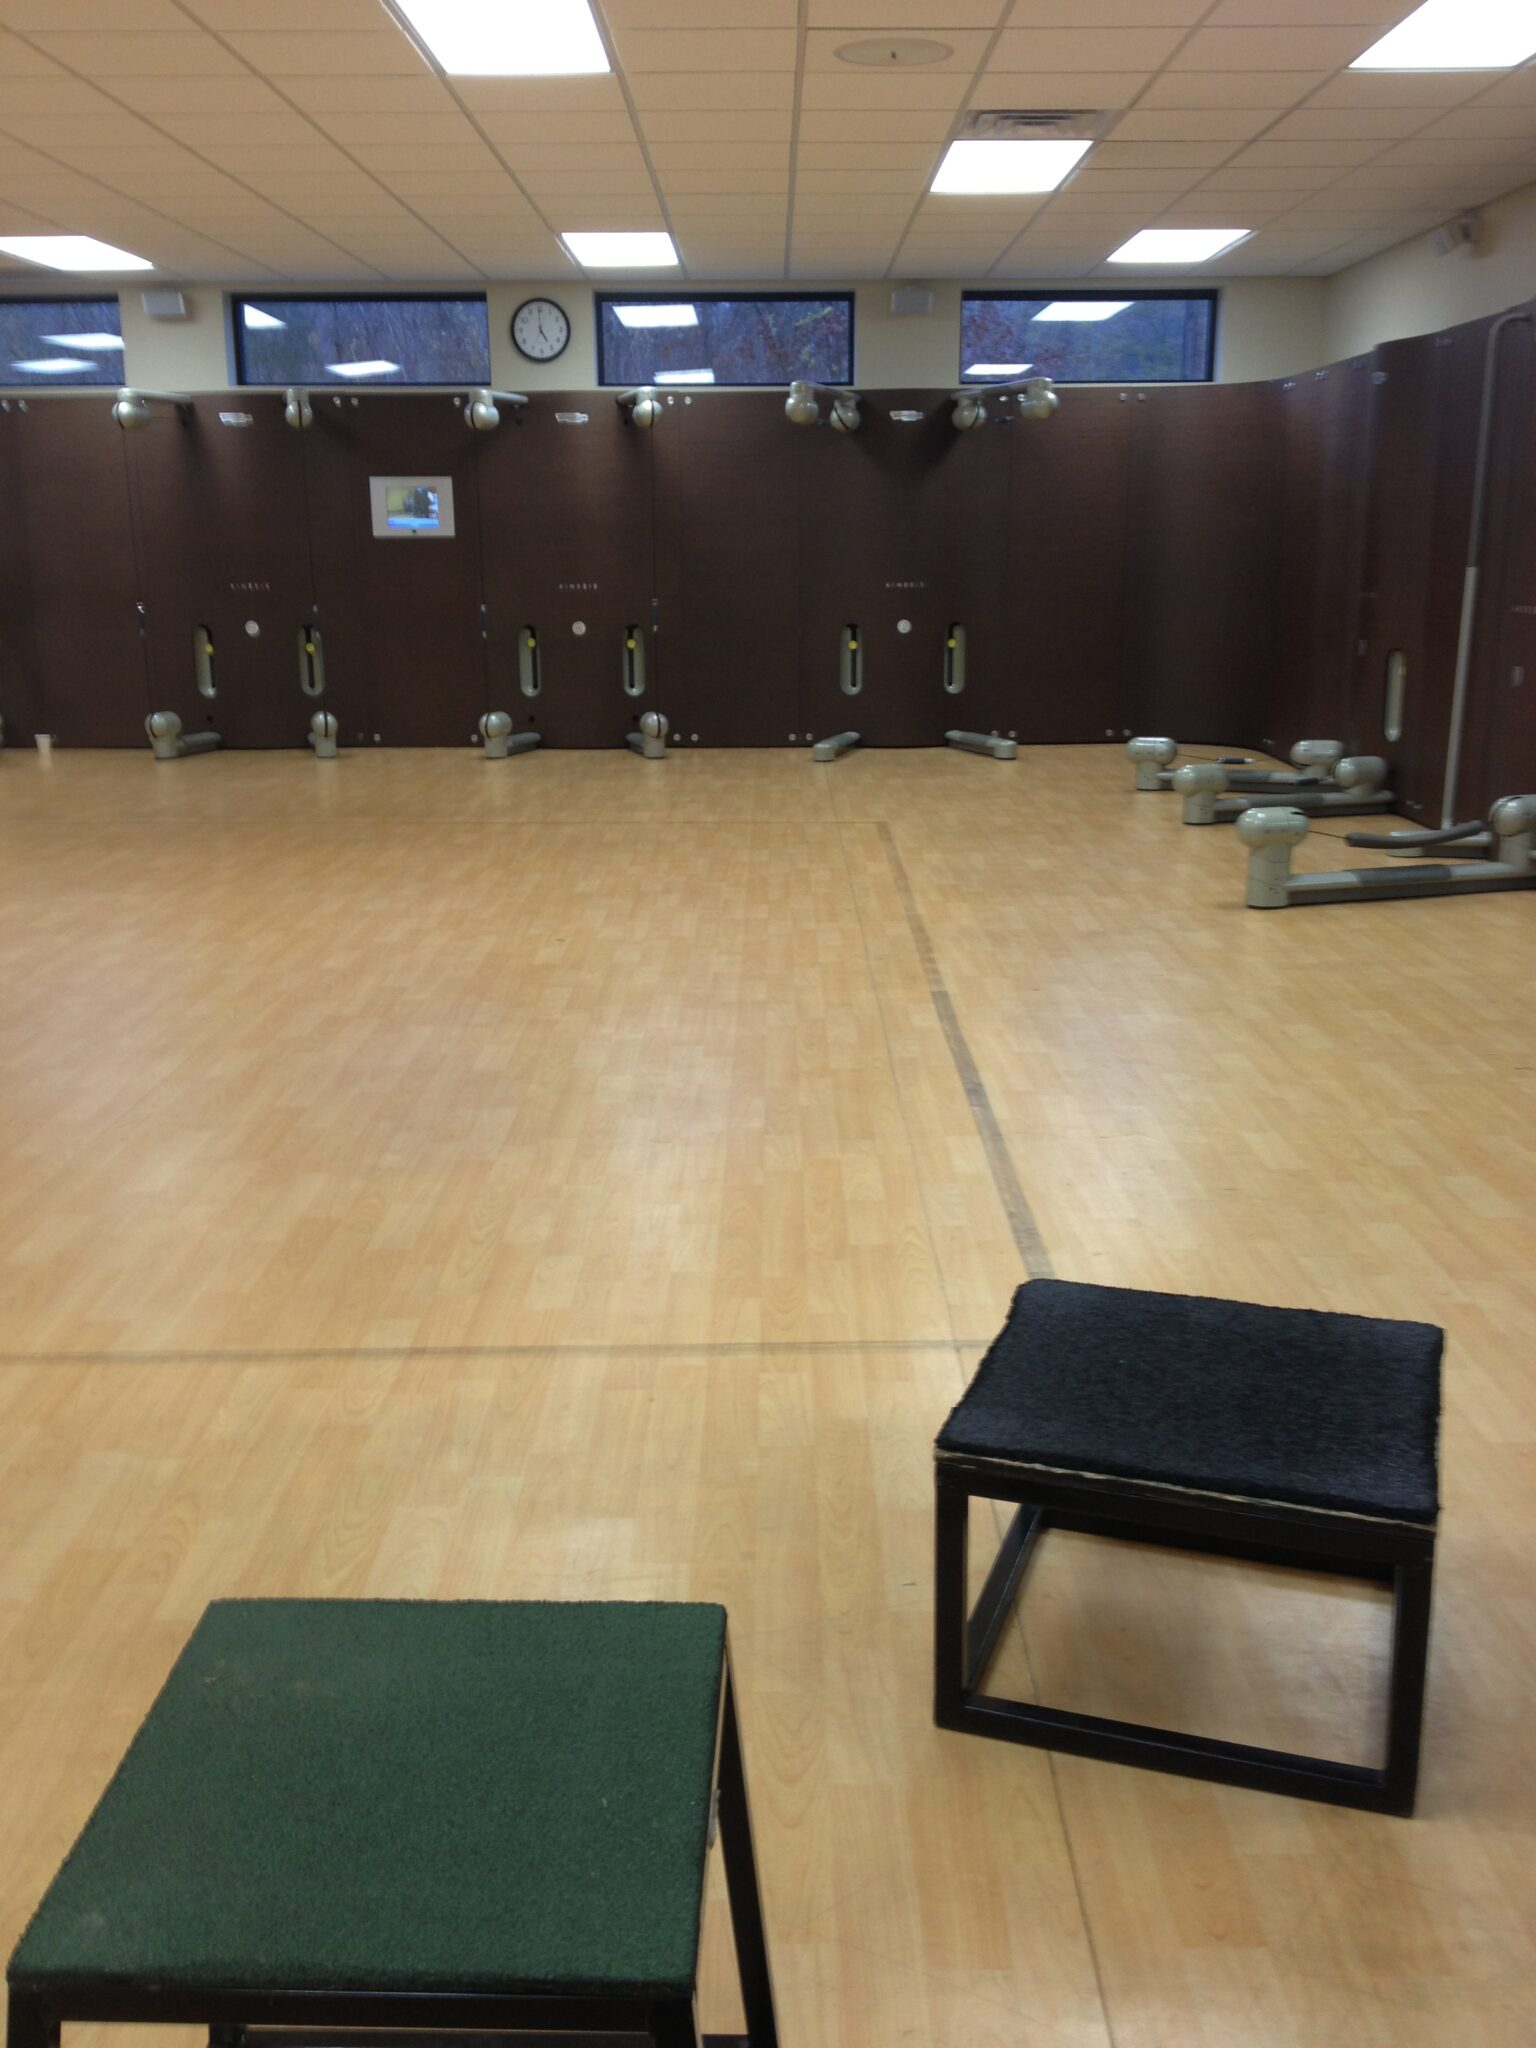 Yoga Studio Cleaning Service